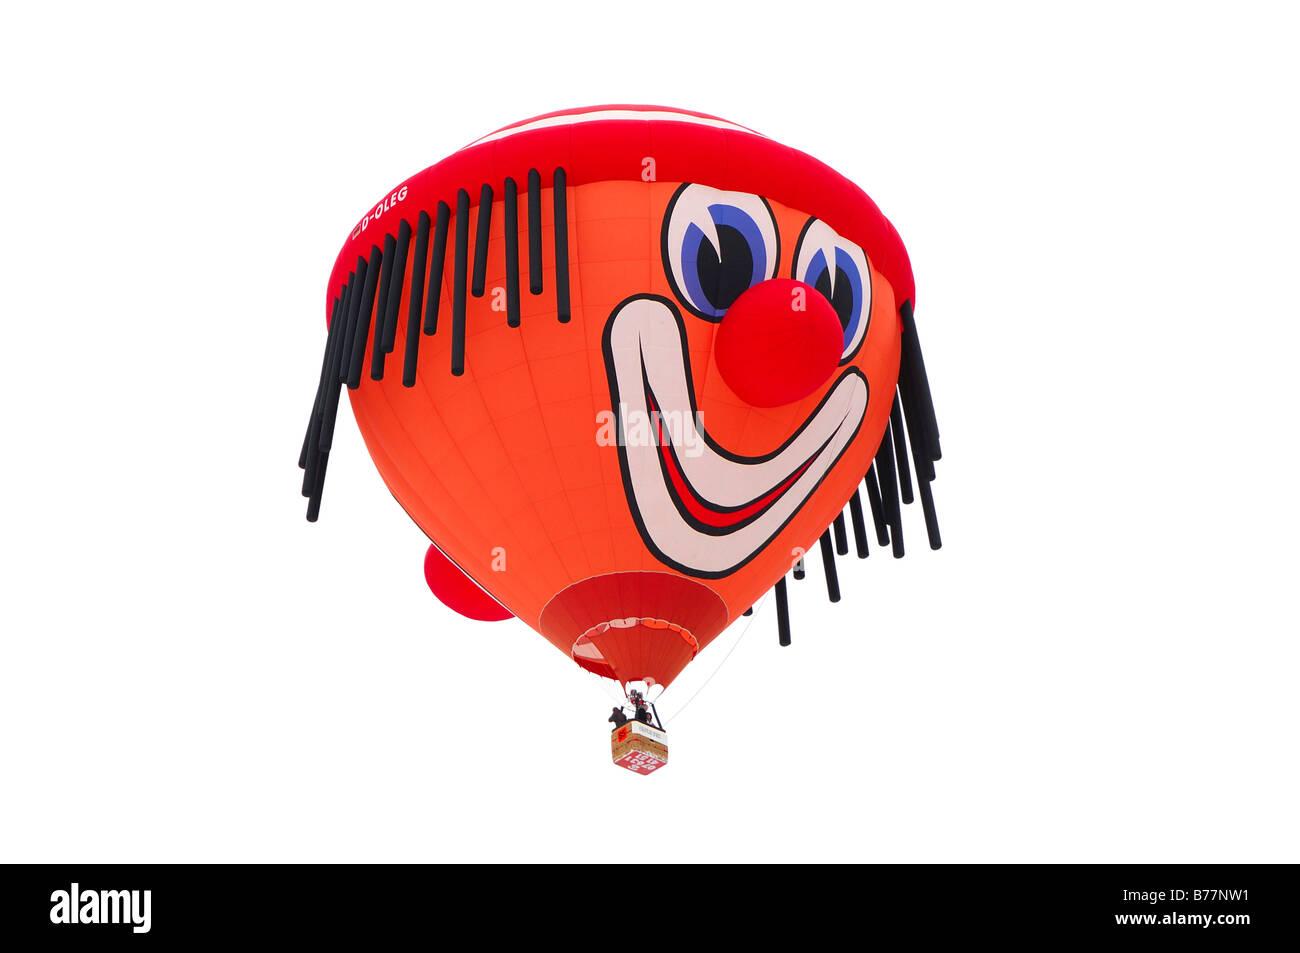 Ballon à air chaud en vol, clown, forme spéciale Schroeder fire balloons Clown SS, montgolfière, International Balloon Banque D'Images